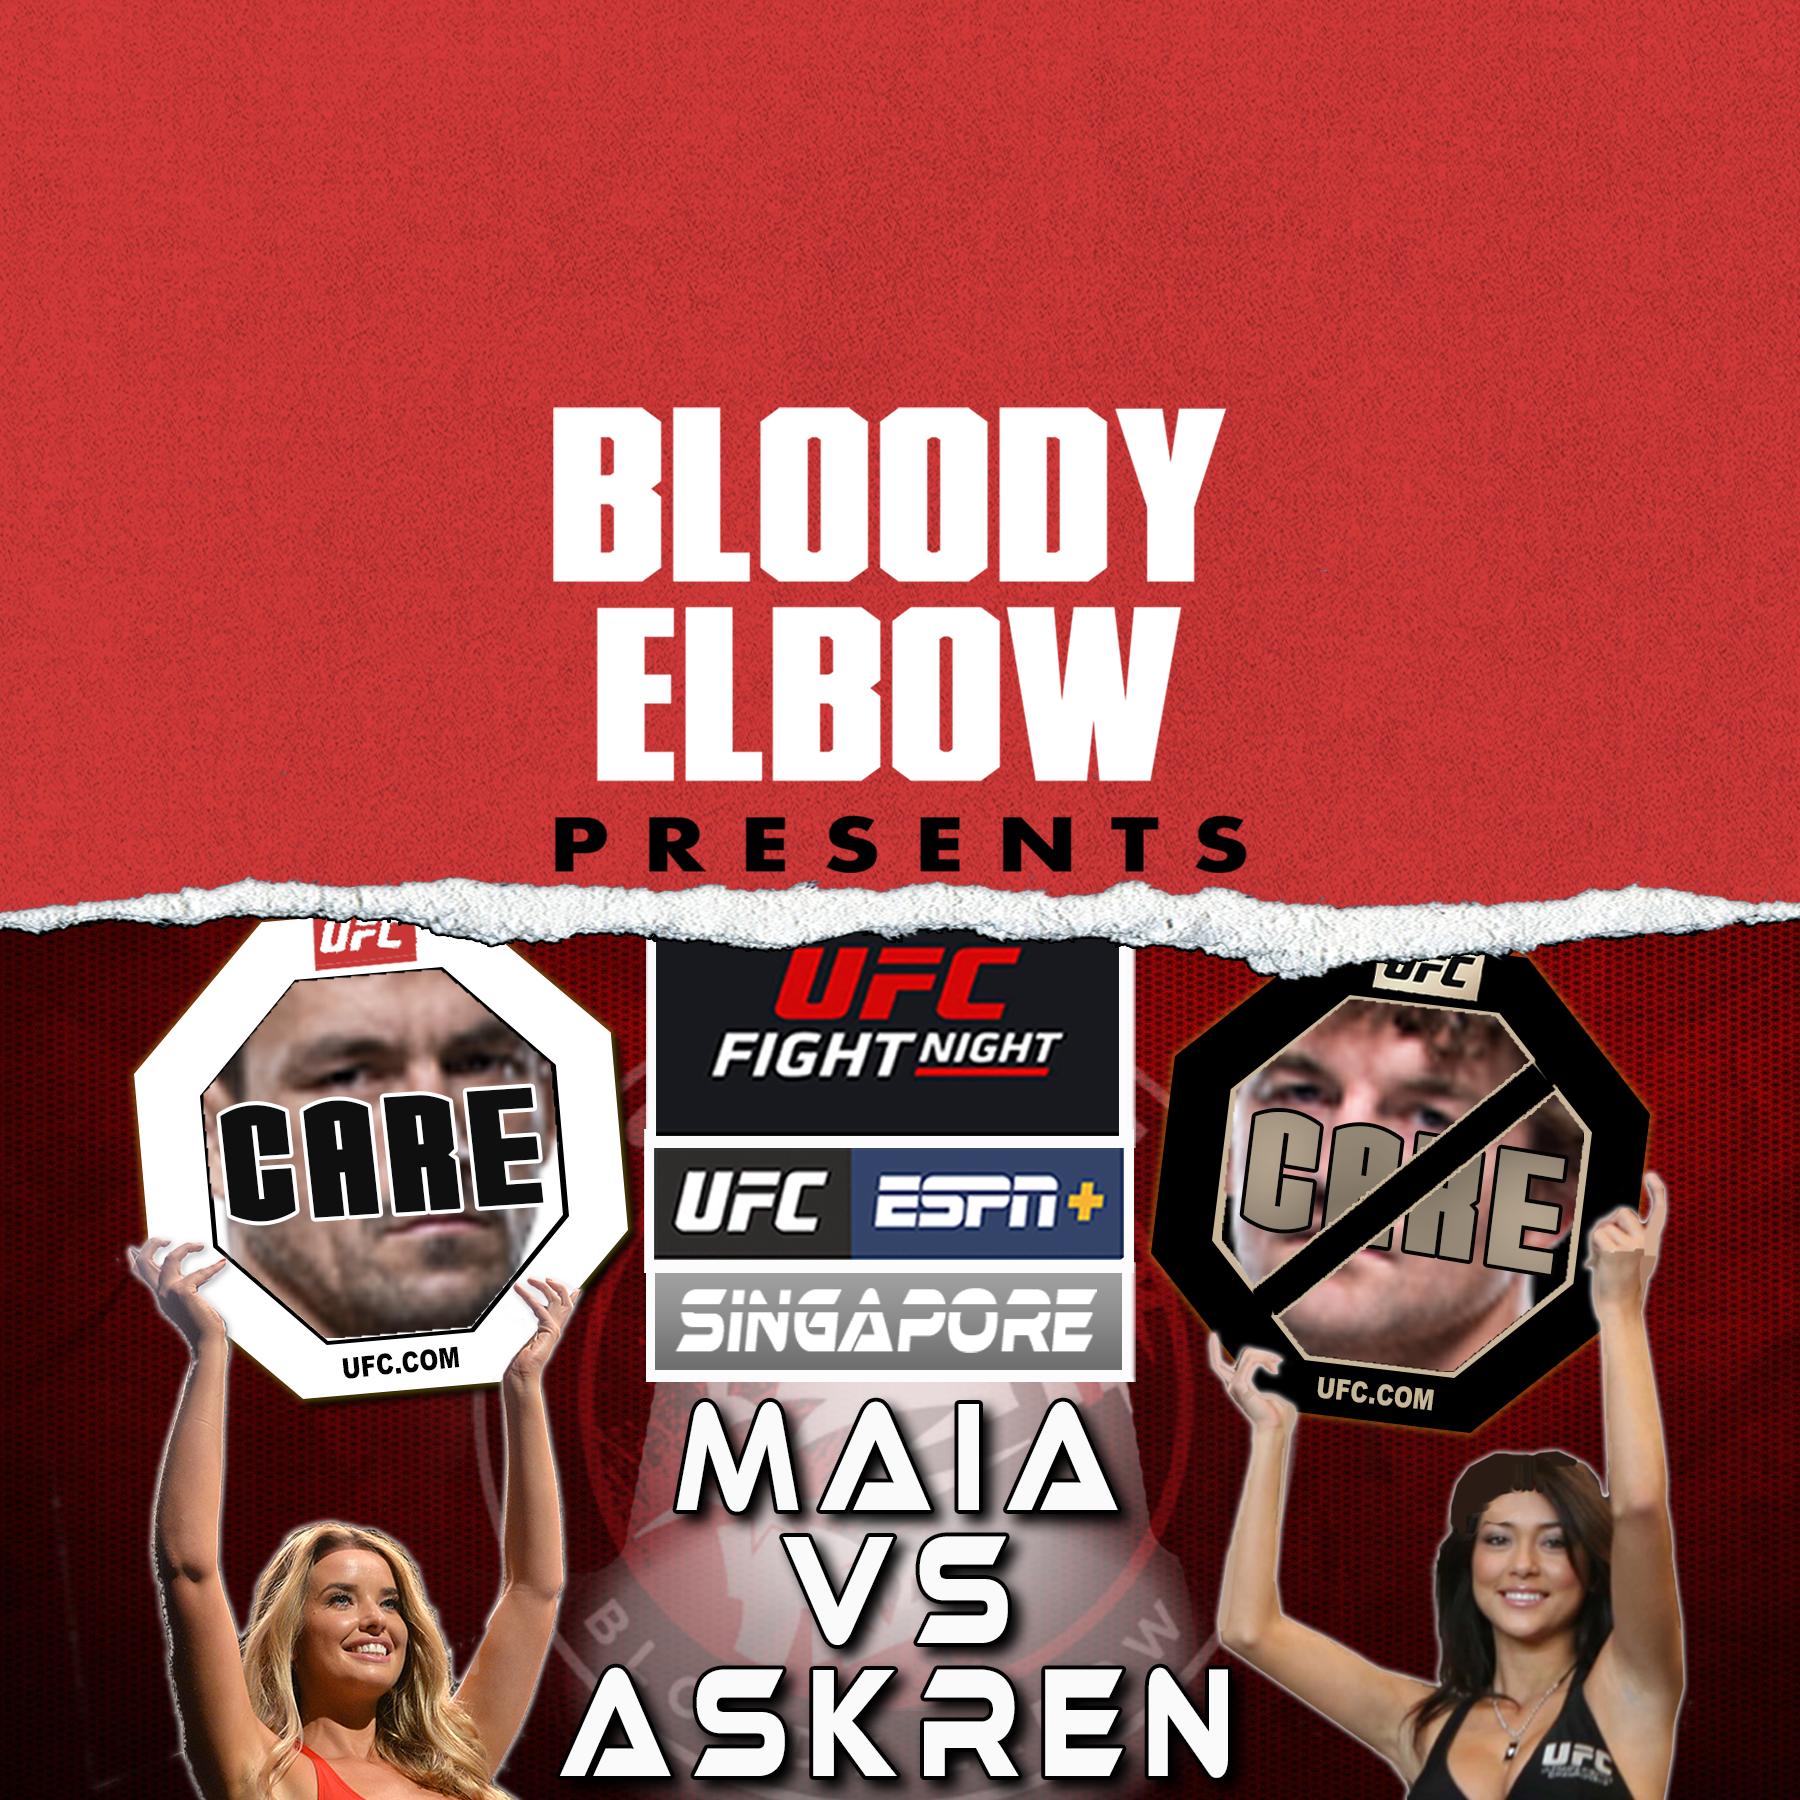 CDC, Care/Don't Care, UFC Boston Review, UFC Singapore Preview, UFC Picks, UFC Results